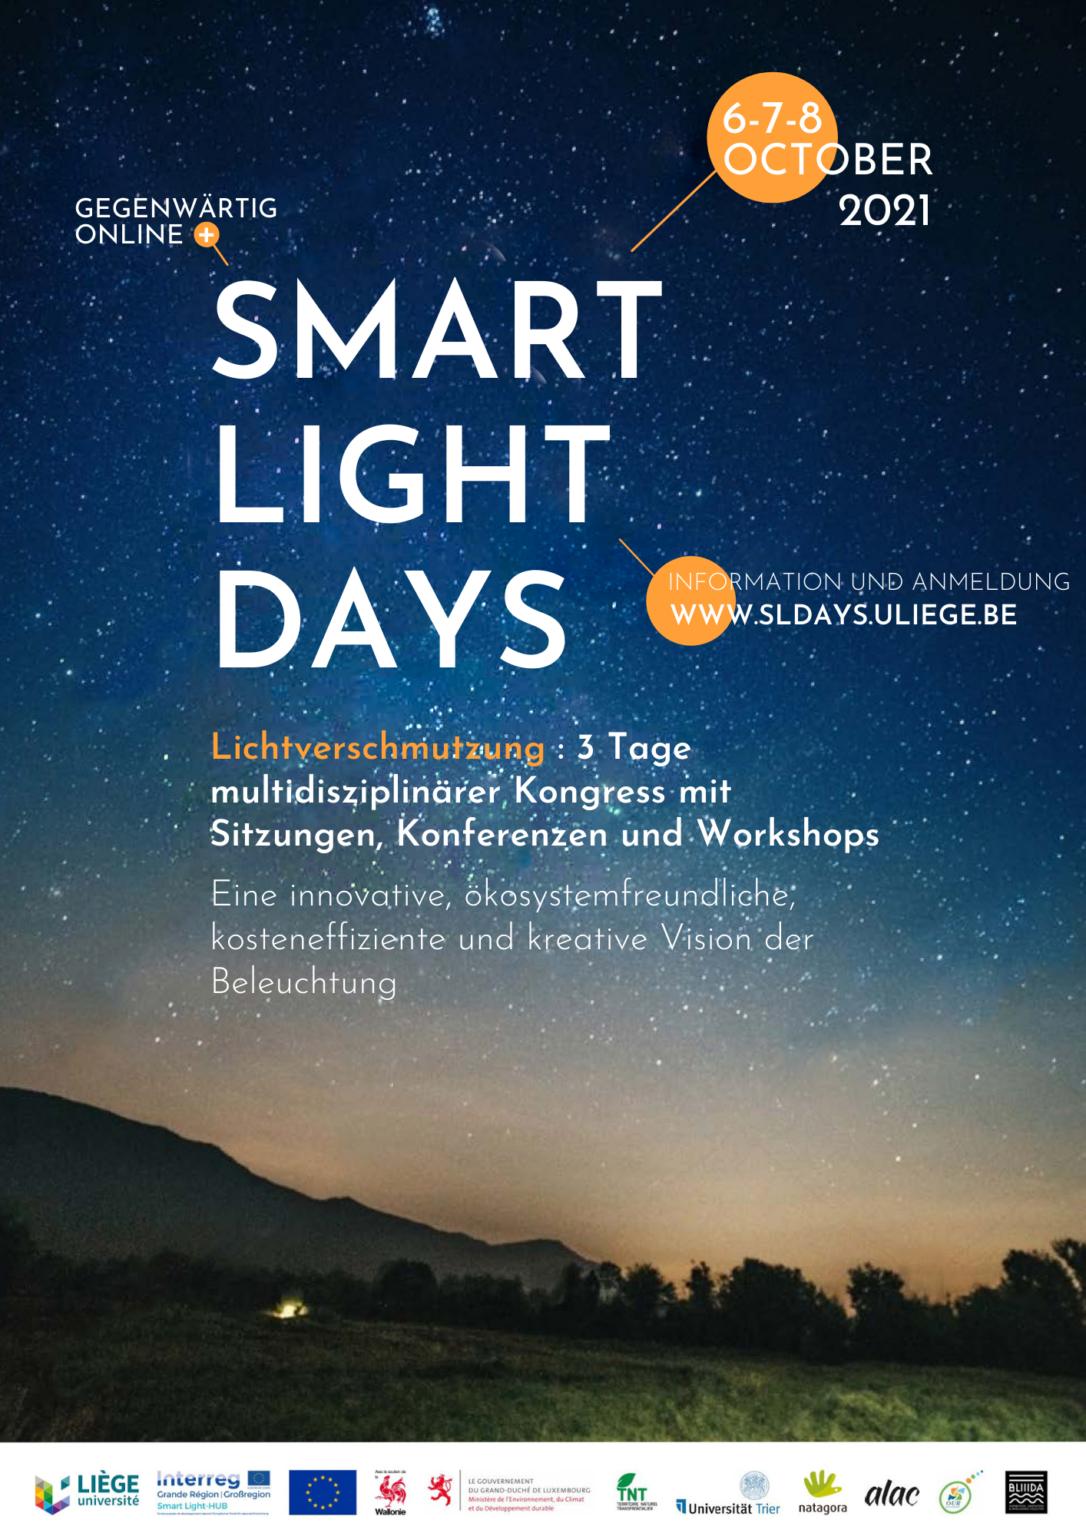 SMART LIGHT DAYS 2021